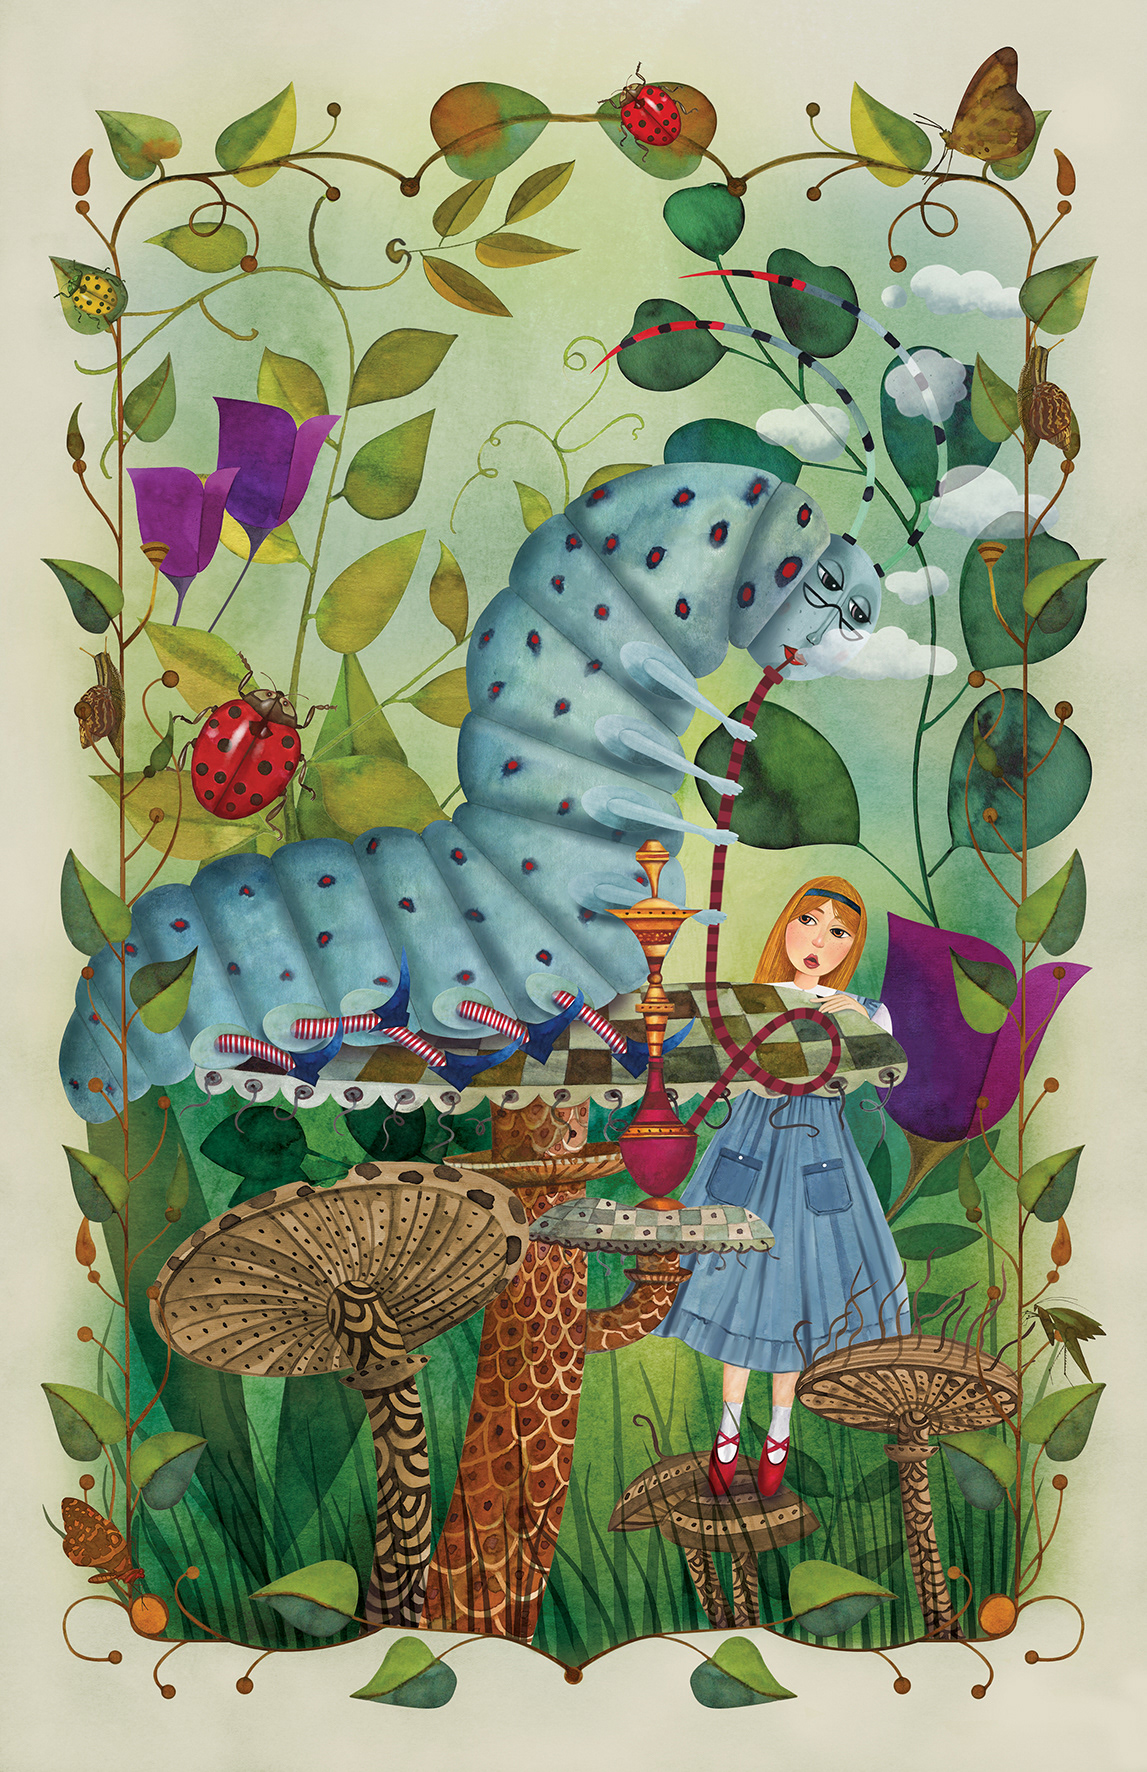 alice in wonderland book design book illustration Caterpillar fairytale girl ILLUSTRATION  photoshop plants